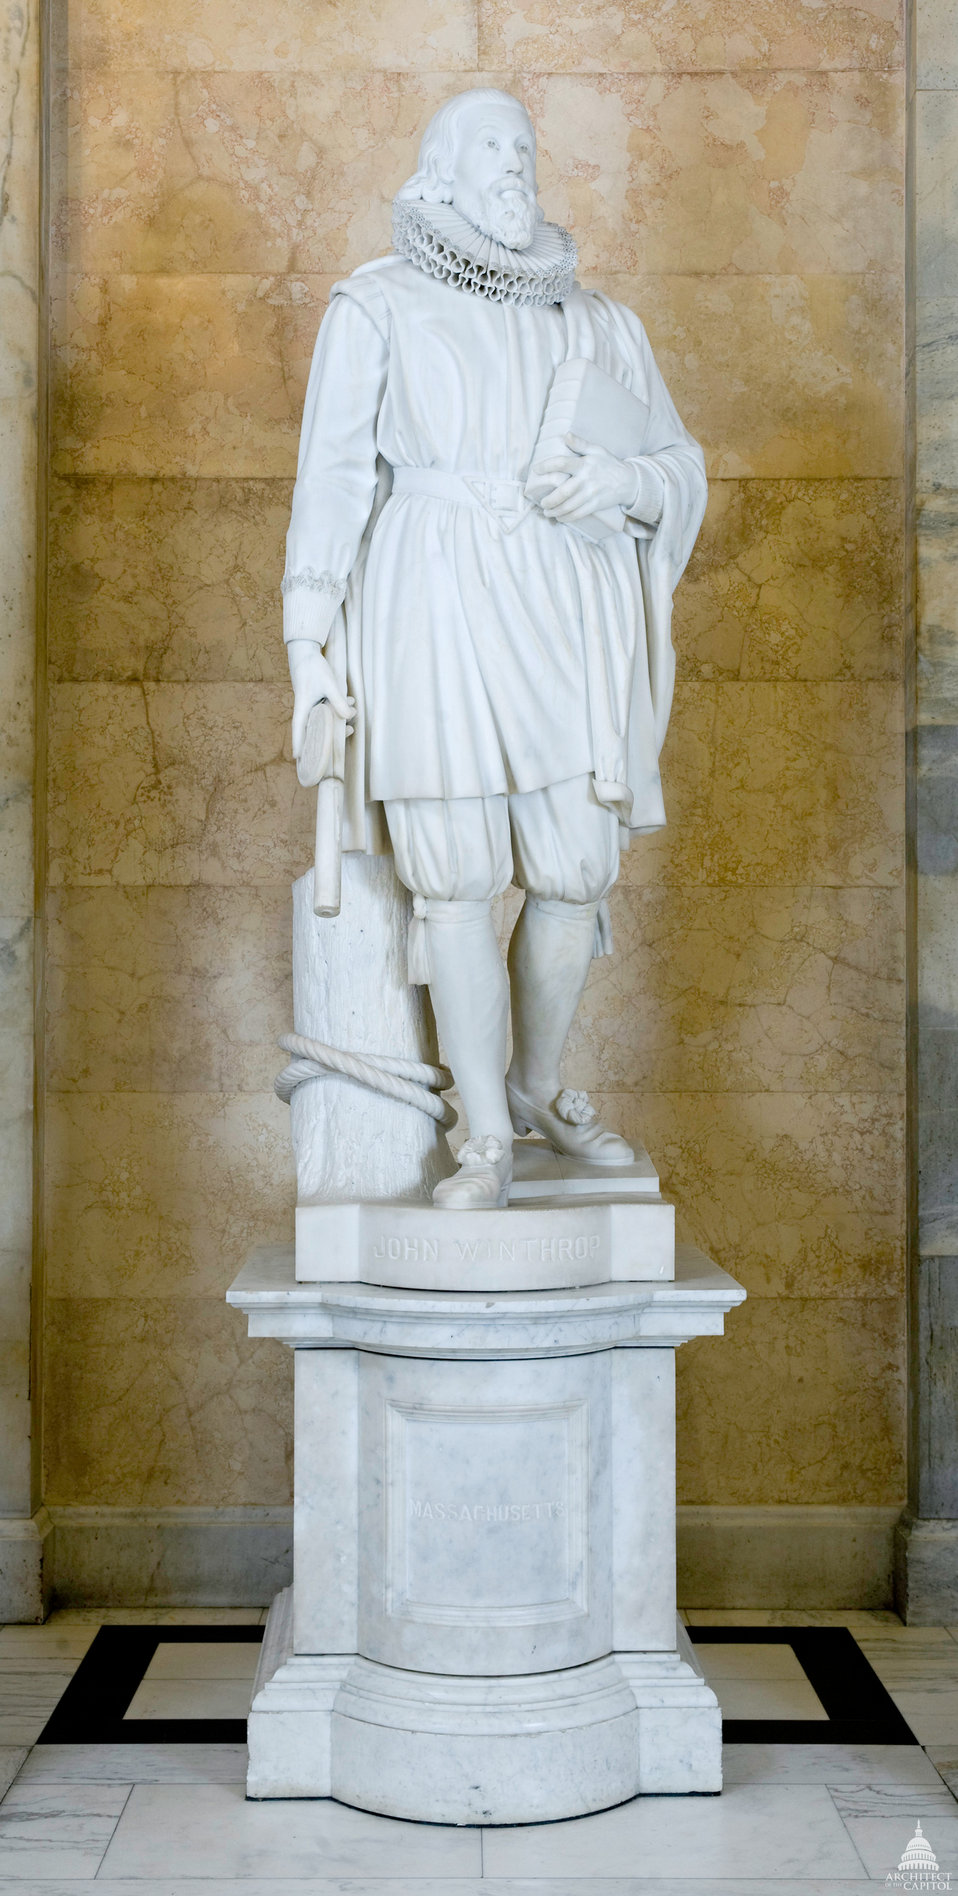 John Winthrop Statue